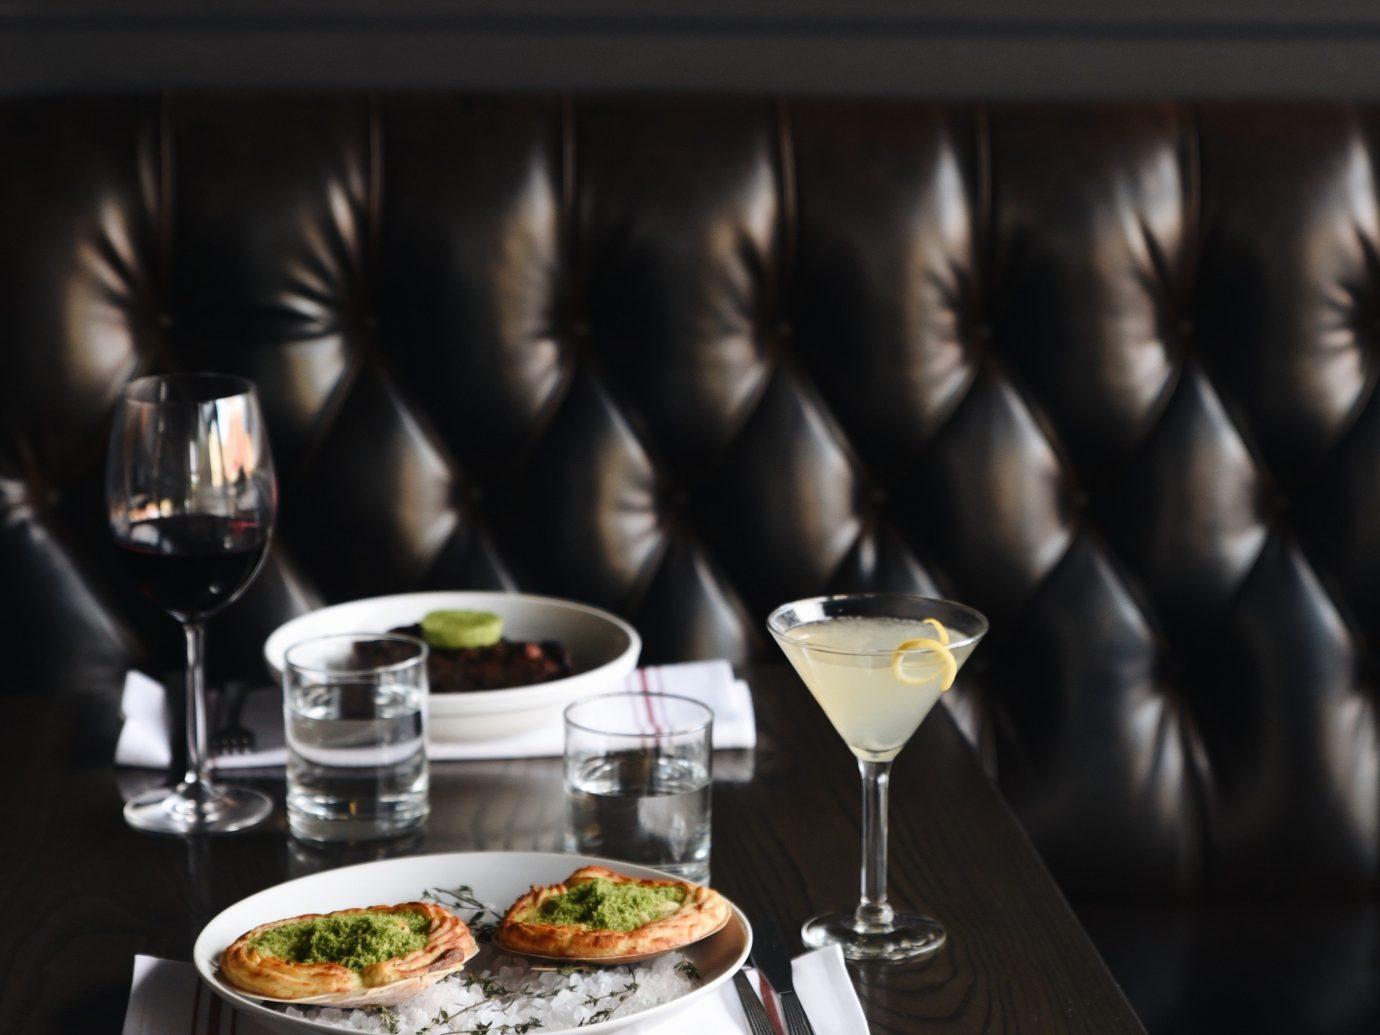 Trip Ideas table indoor plate meal furniture restaurant dinner cuisine food dish set